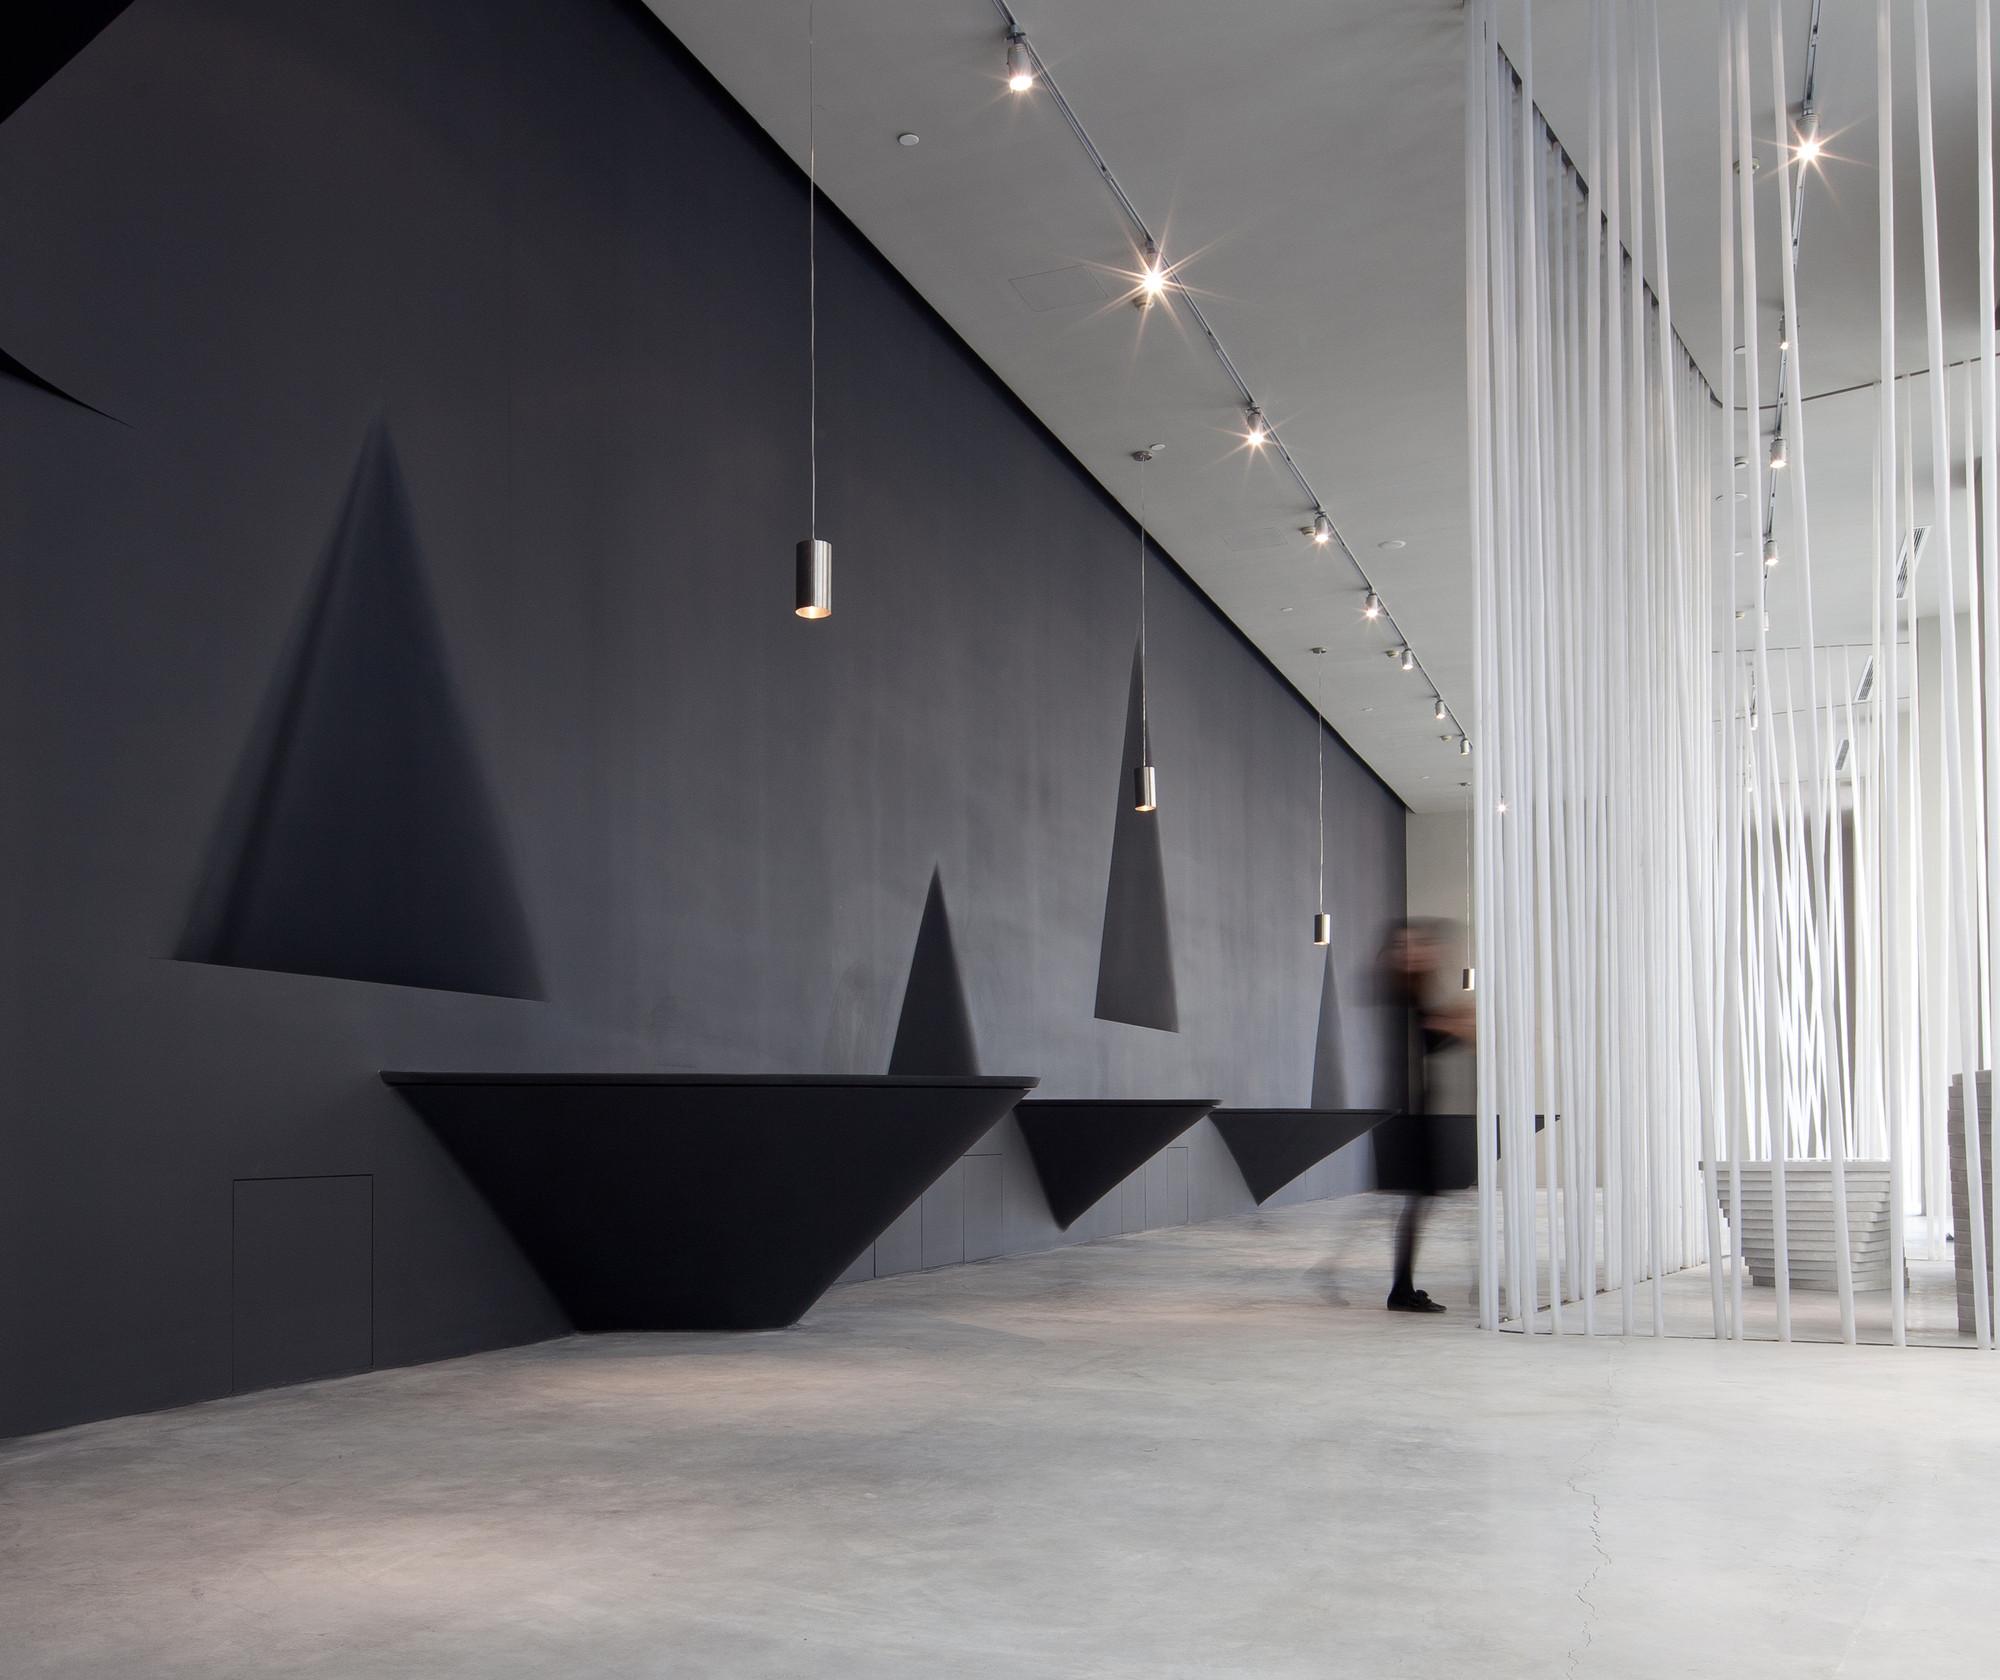 EMG Shanghai Design Centre / O-OFFICE Architects, © Likyfoto